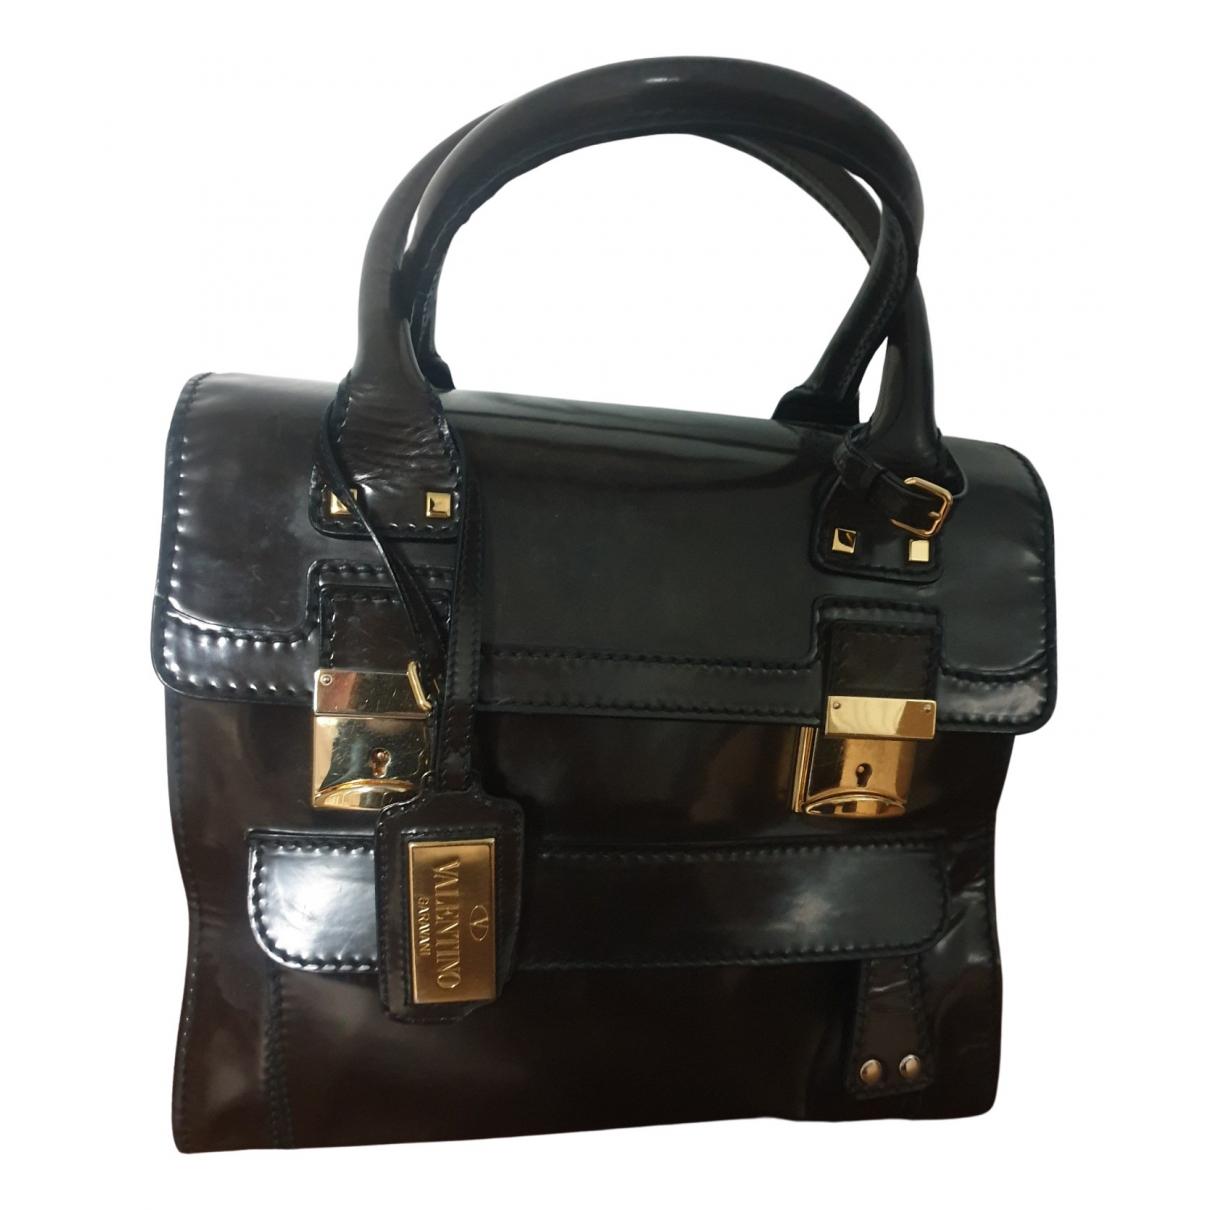 Valentino Garavani N Brown Leather handbag for Women N